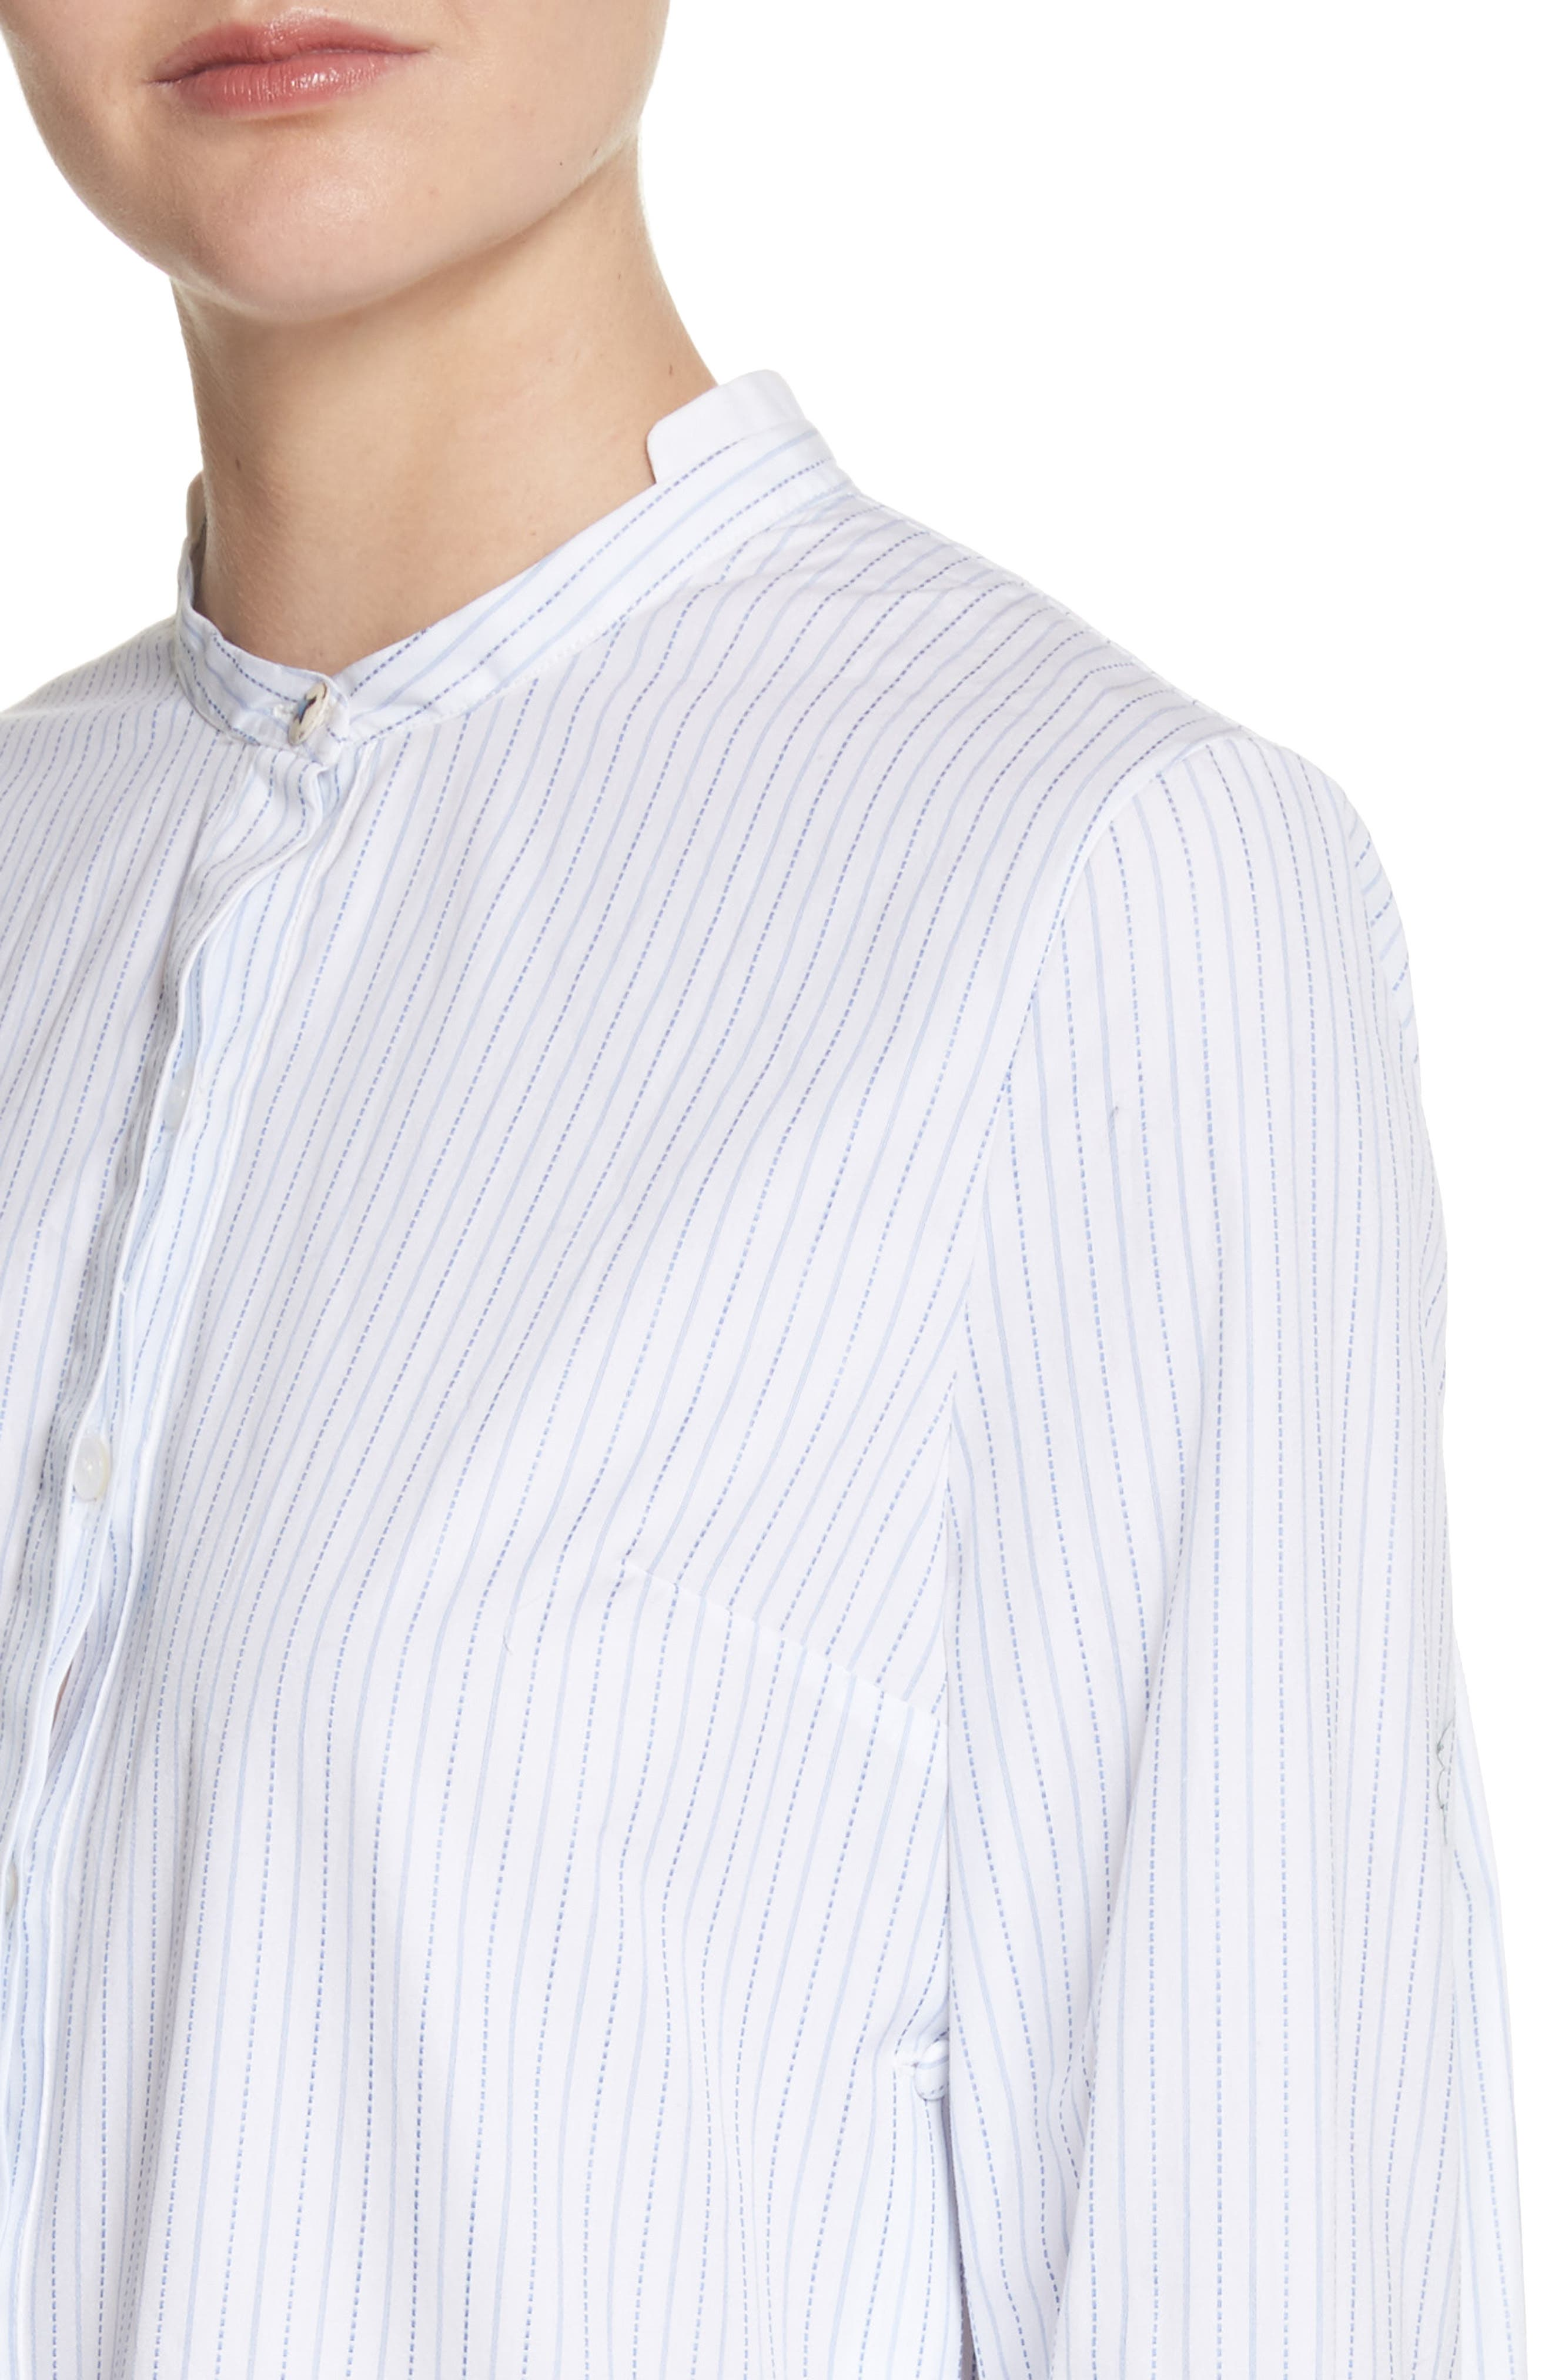 High/Low Stripe Cotton Poplin Shirt,                             Alternate thumbnail 4, color,                             White/ Blue